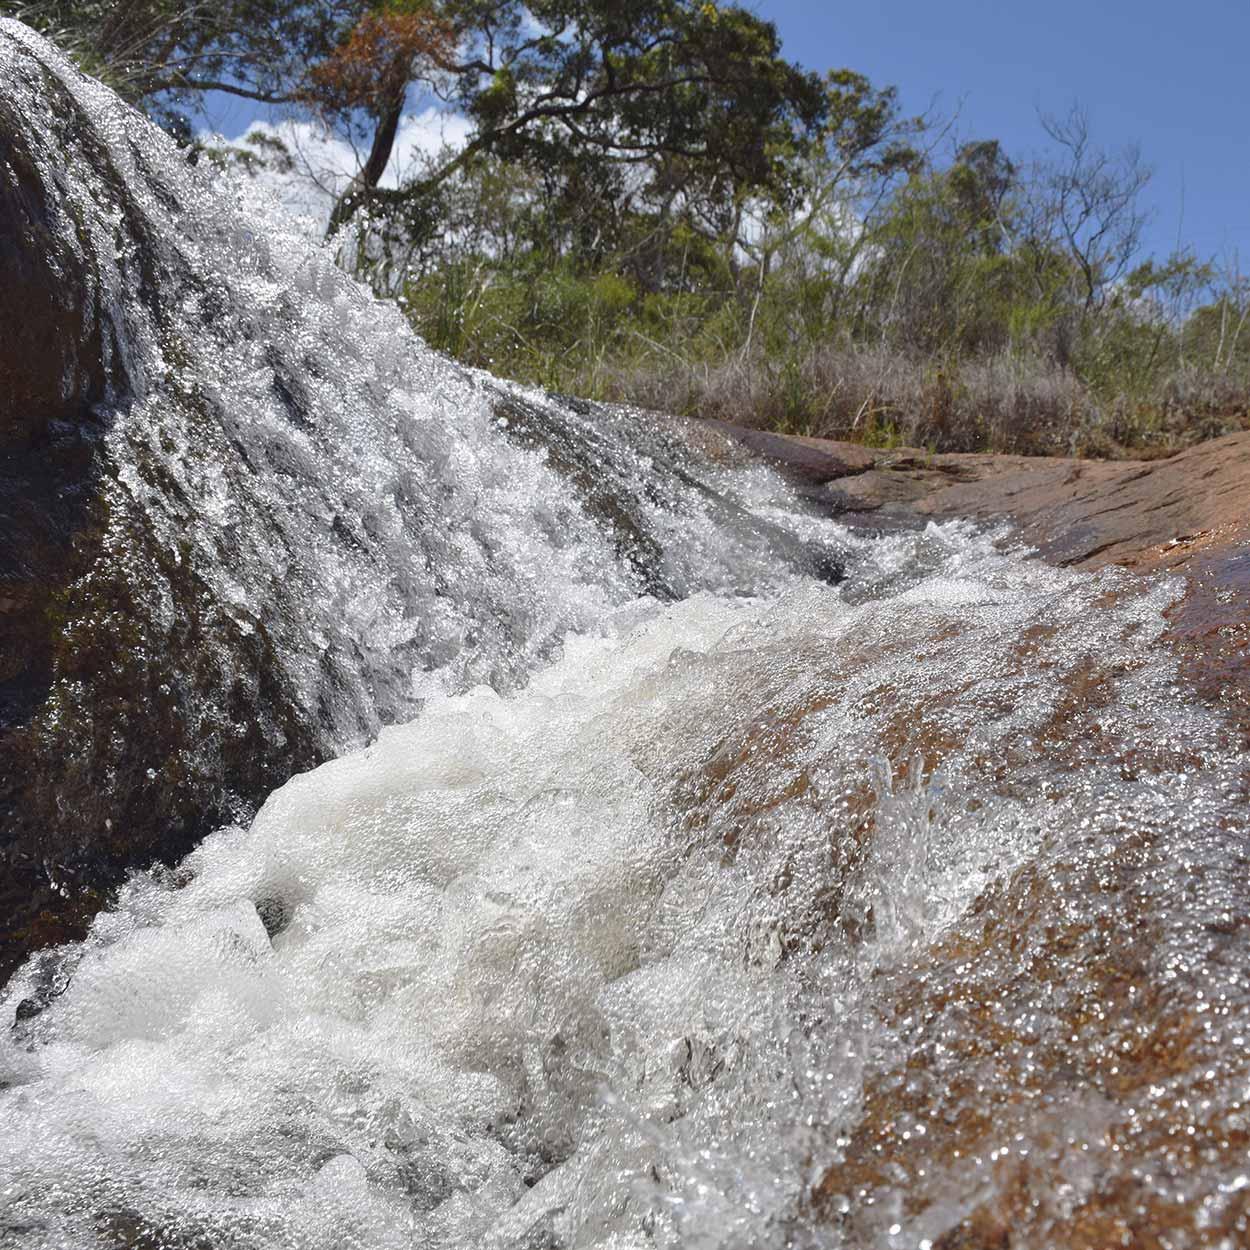 The Cascades, Mundy Regional Park, Perth, Western Australia